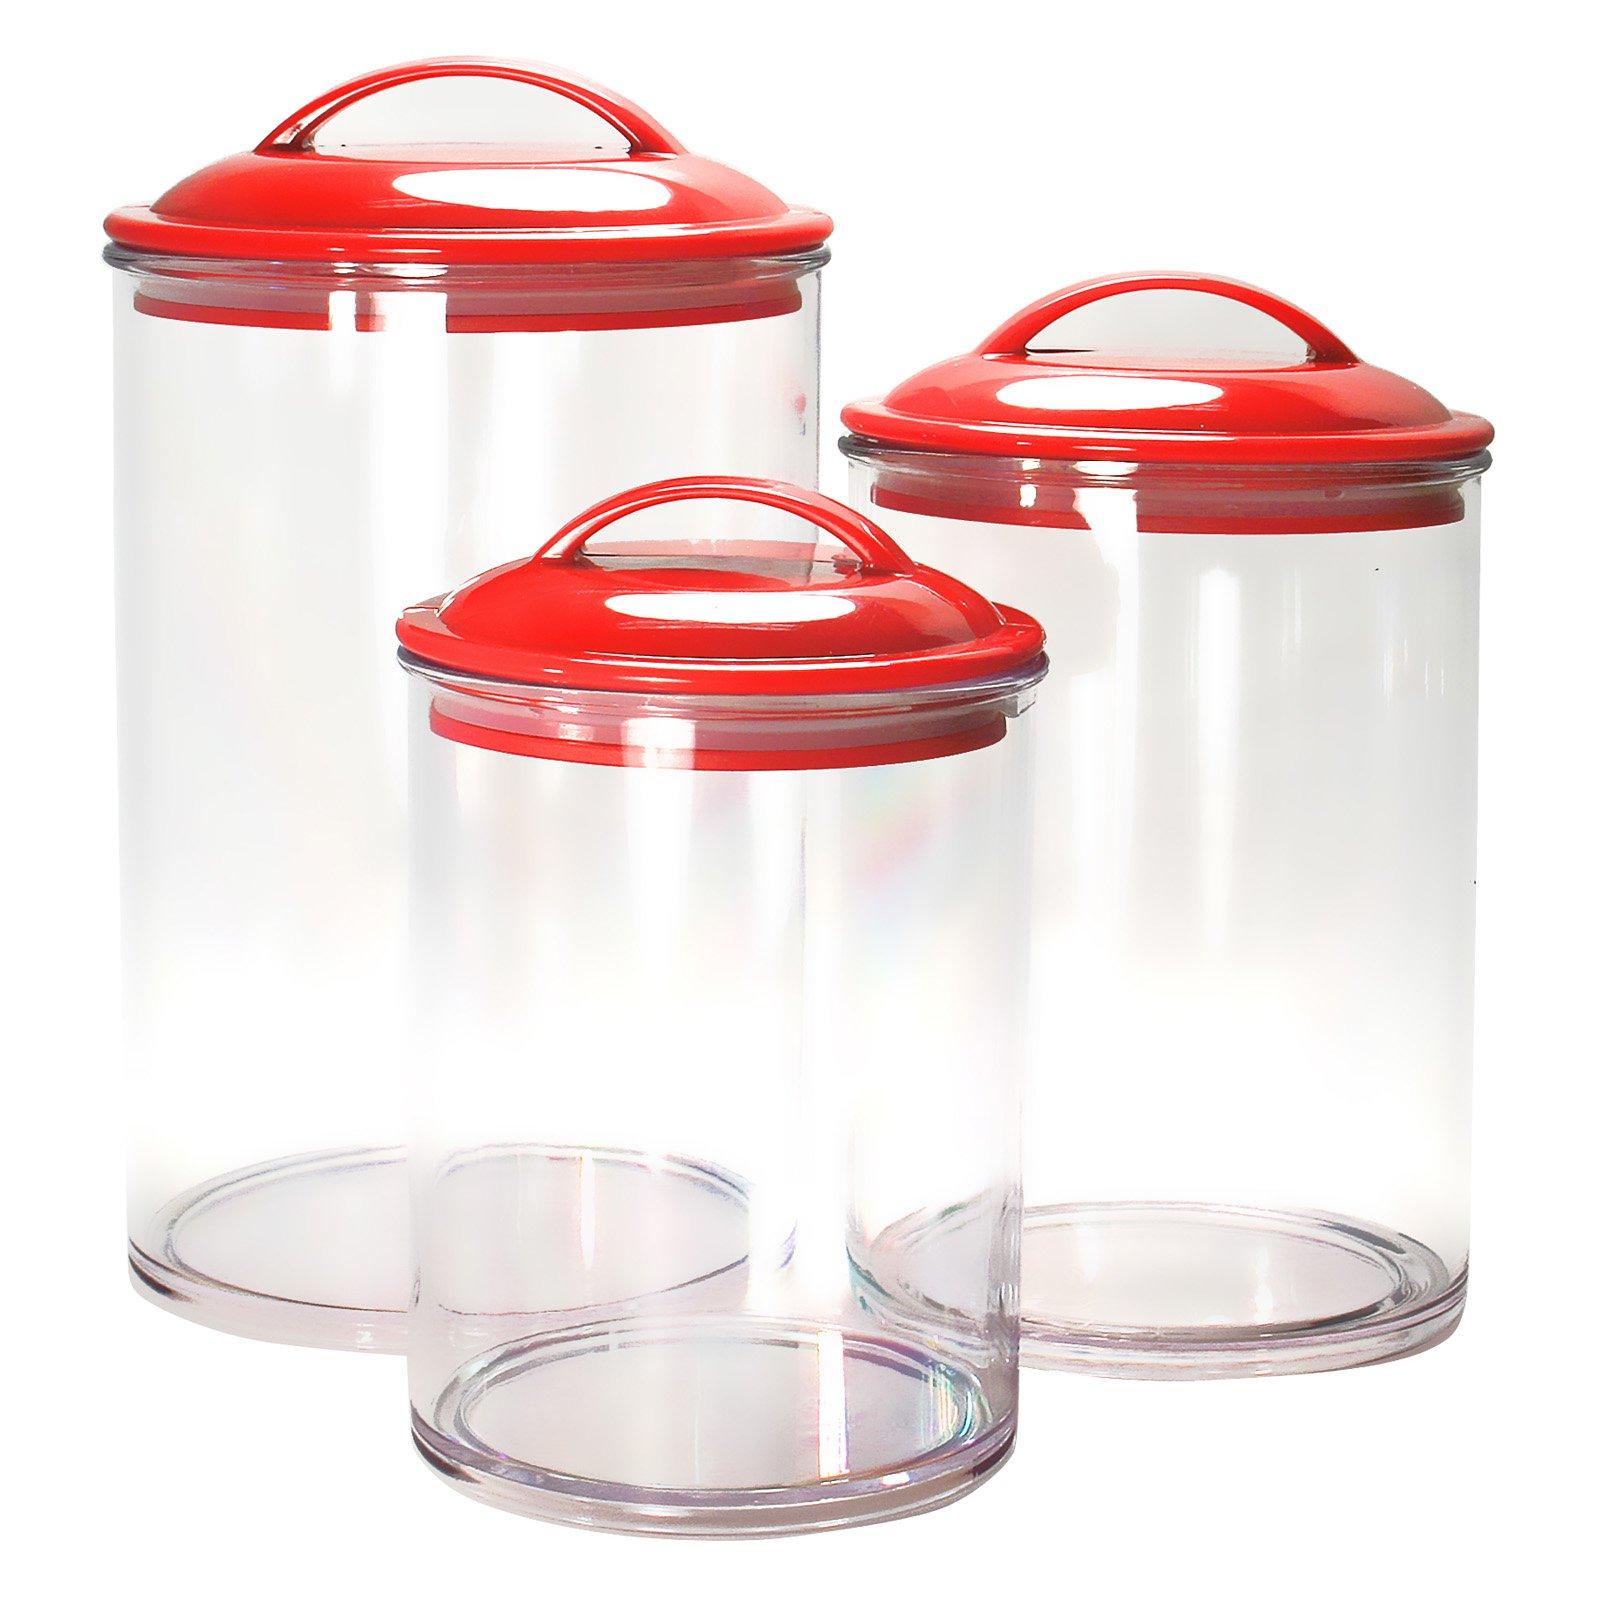 Calypso Basics, Acrylic Canister Set of 3, Red